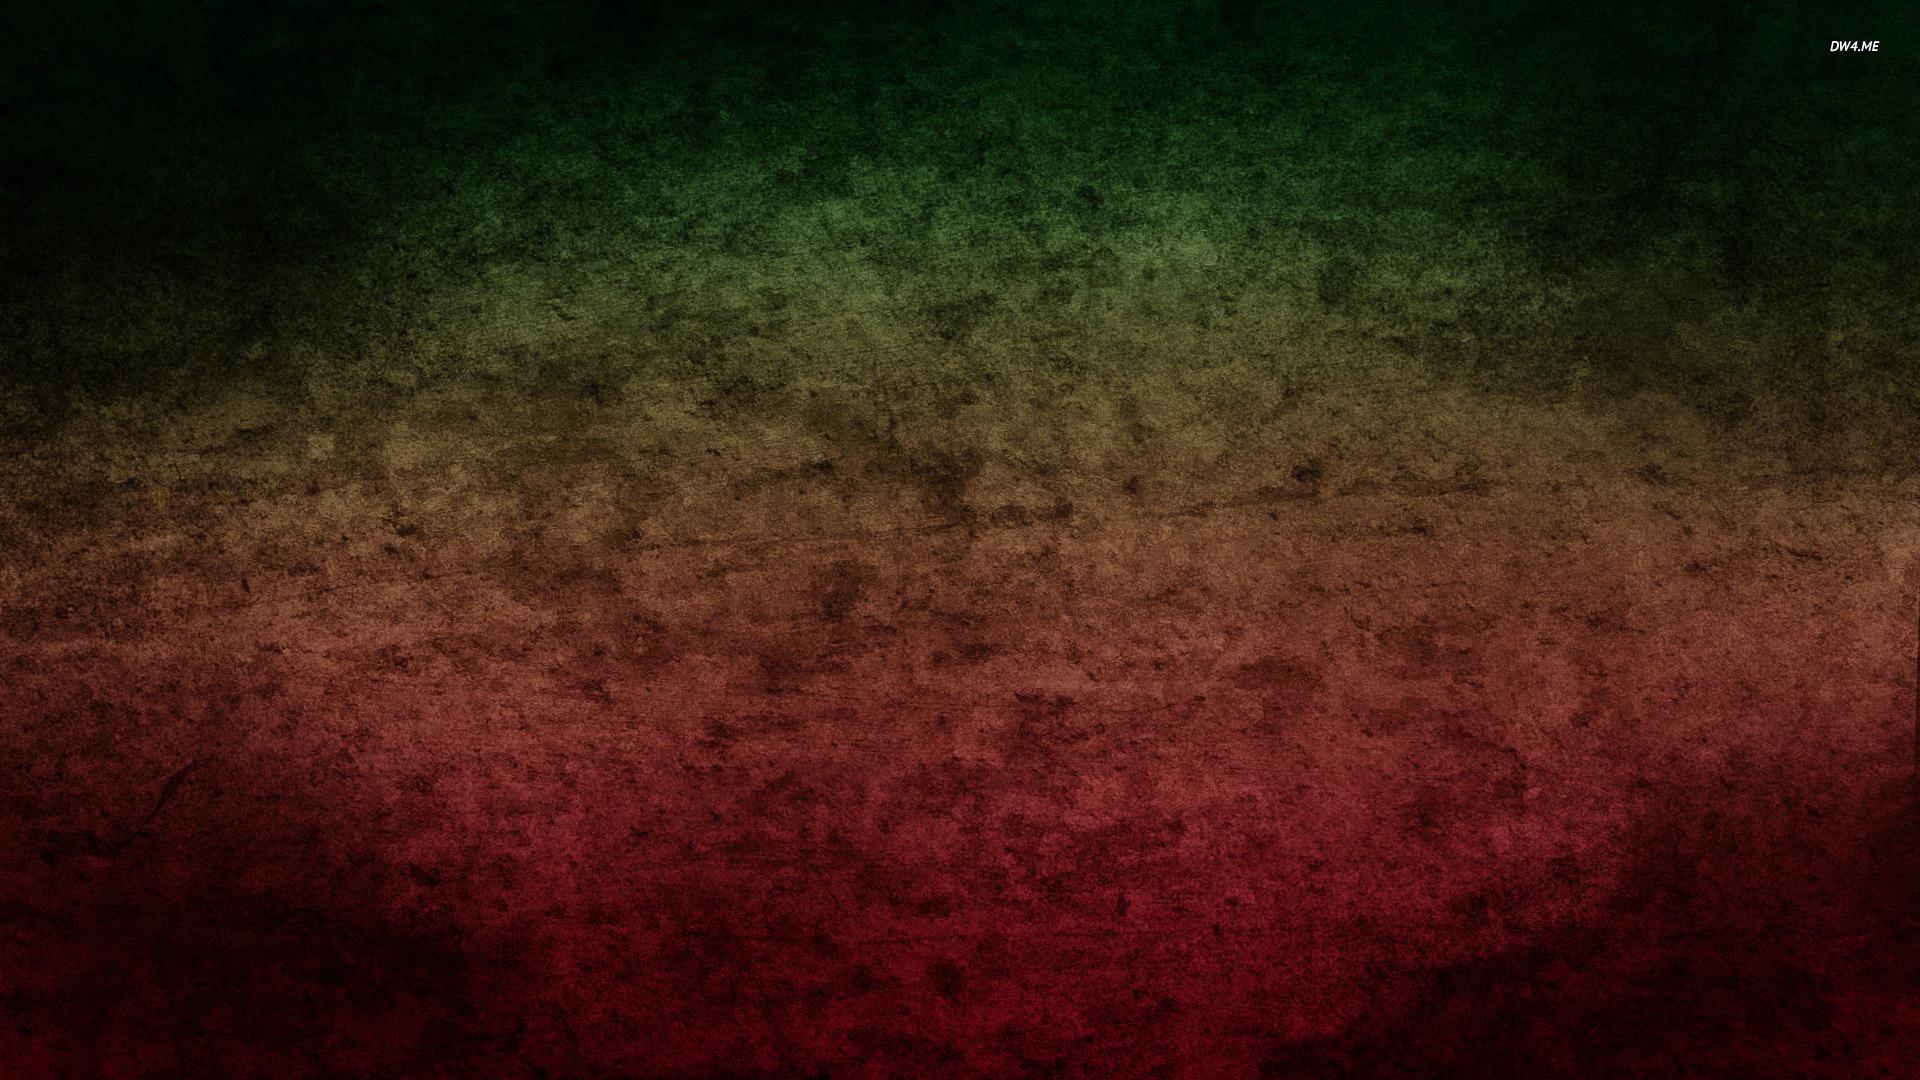 Grunge texture wallpaper   Abstract wallpapers   753 1920x1080